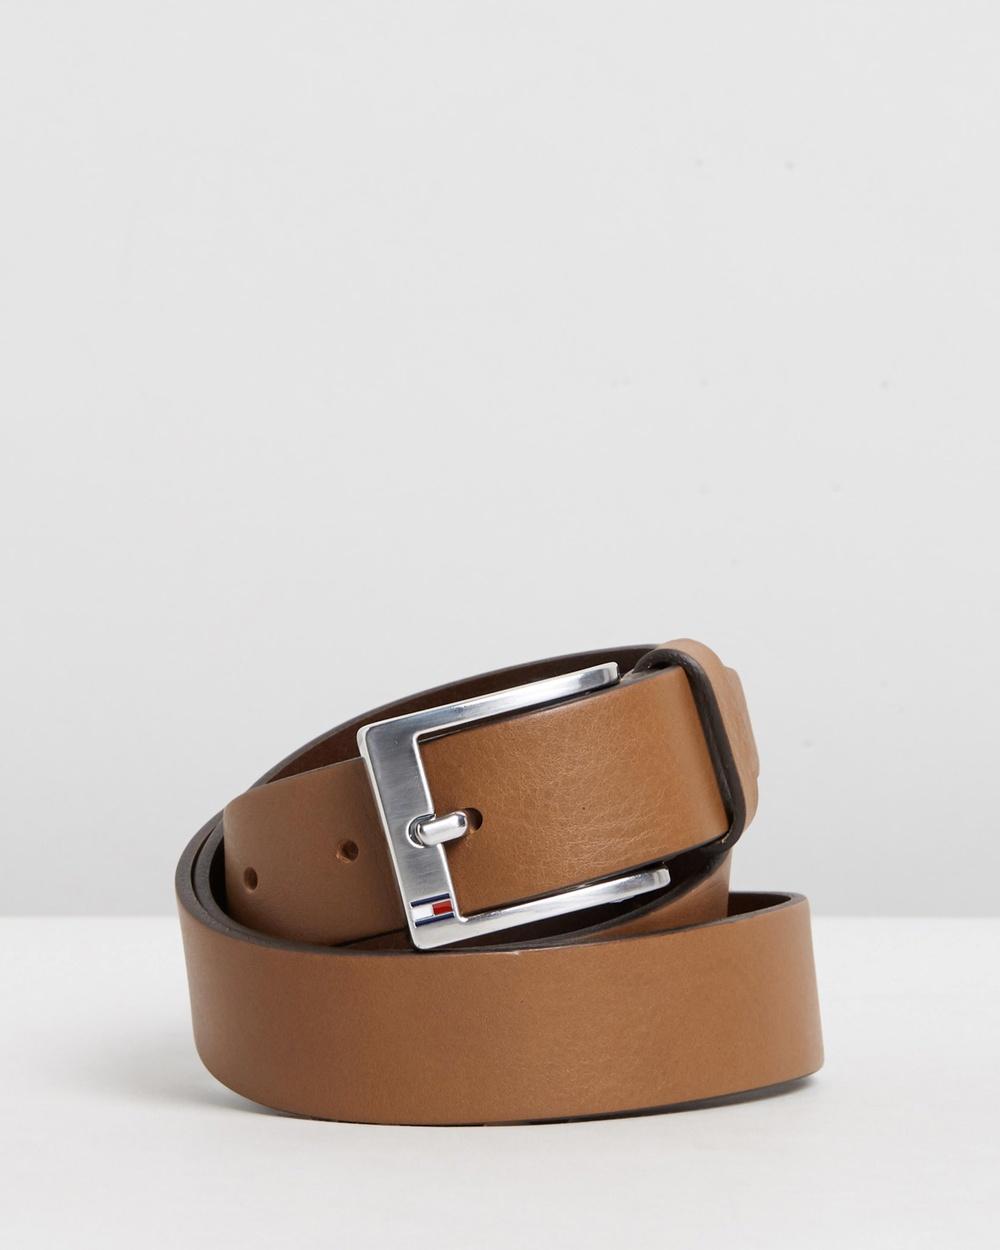 Tommy Hilfiger New Aly Belt Belts Dark Tan